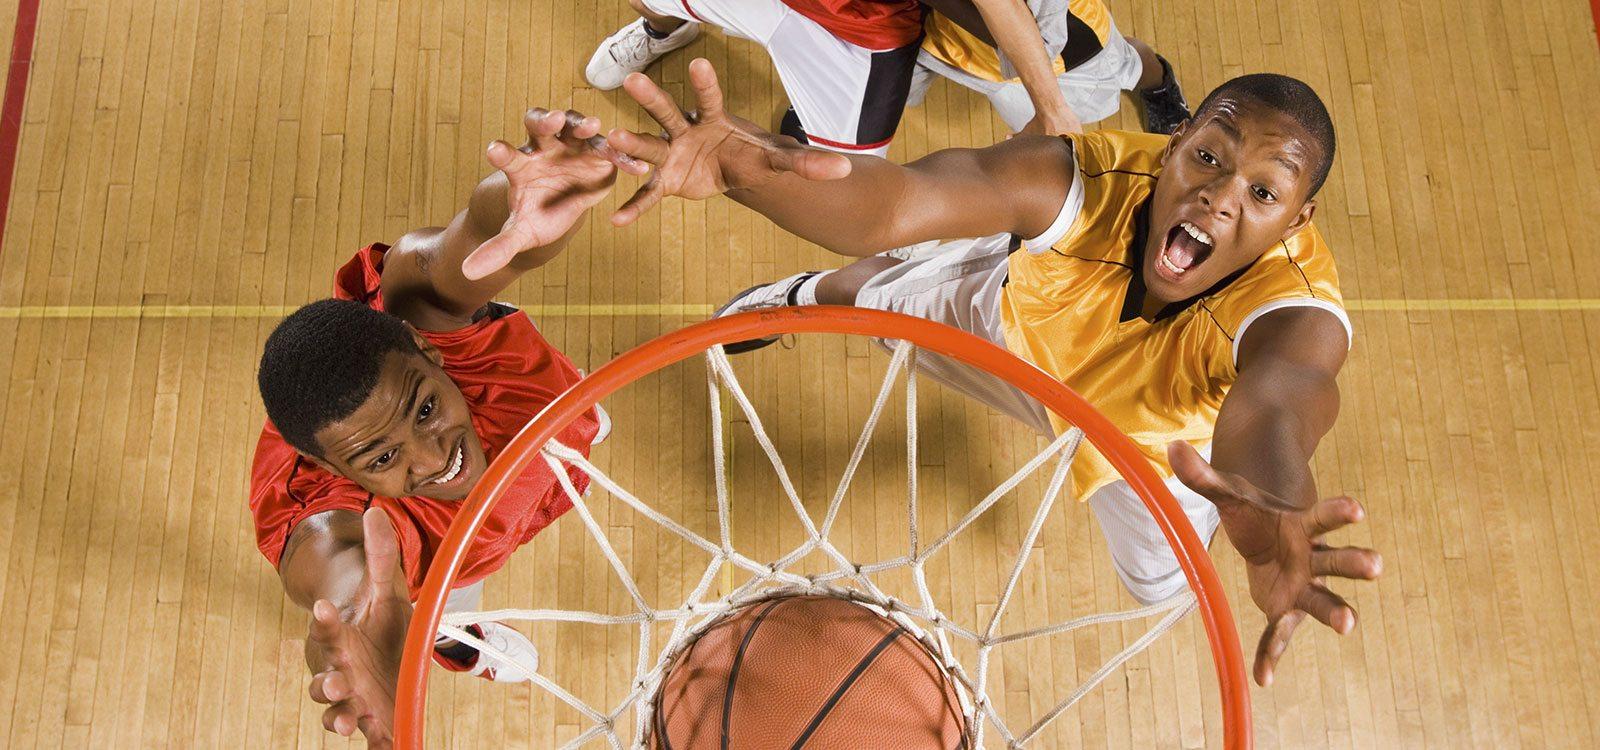 https://www.wabashcountyymca.org/sites/default/files/revslider/image/adult-basketball.jpg